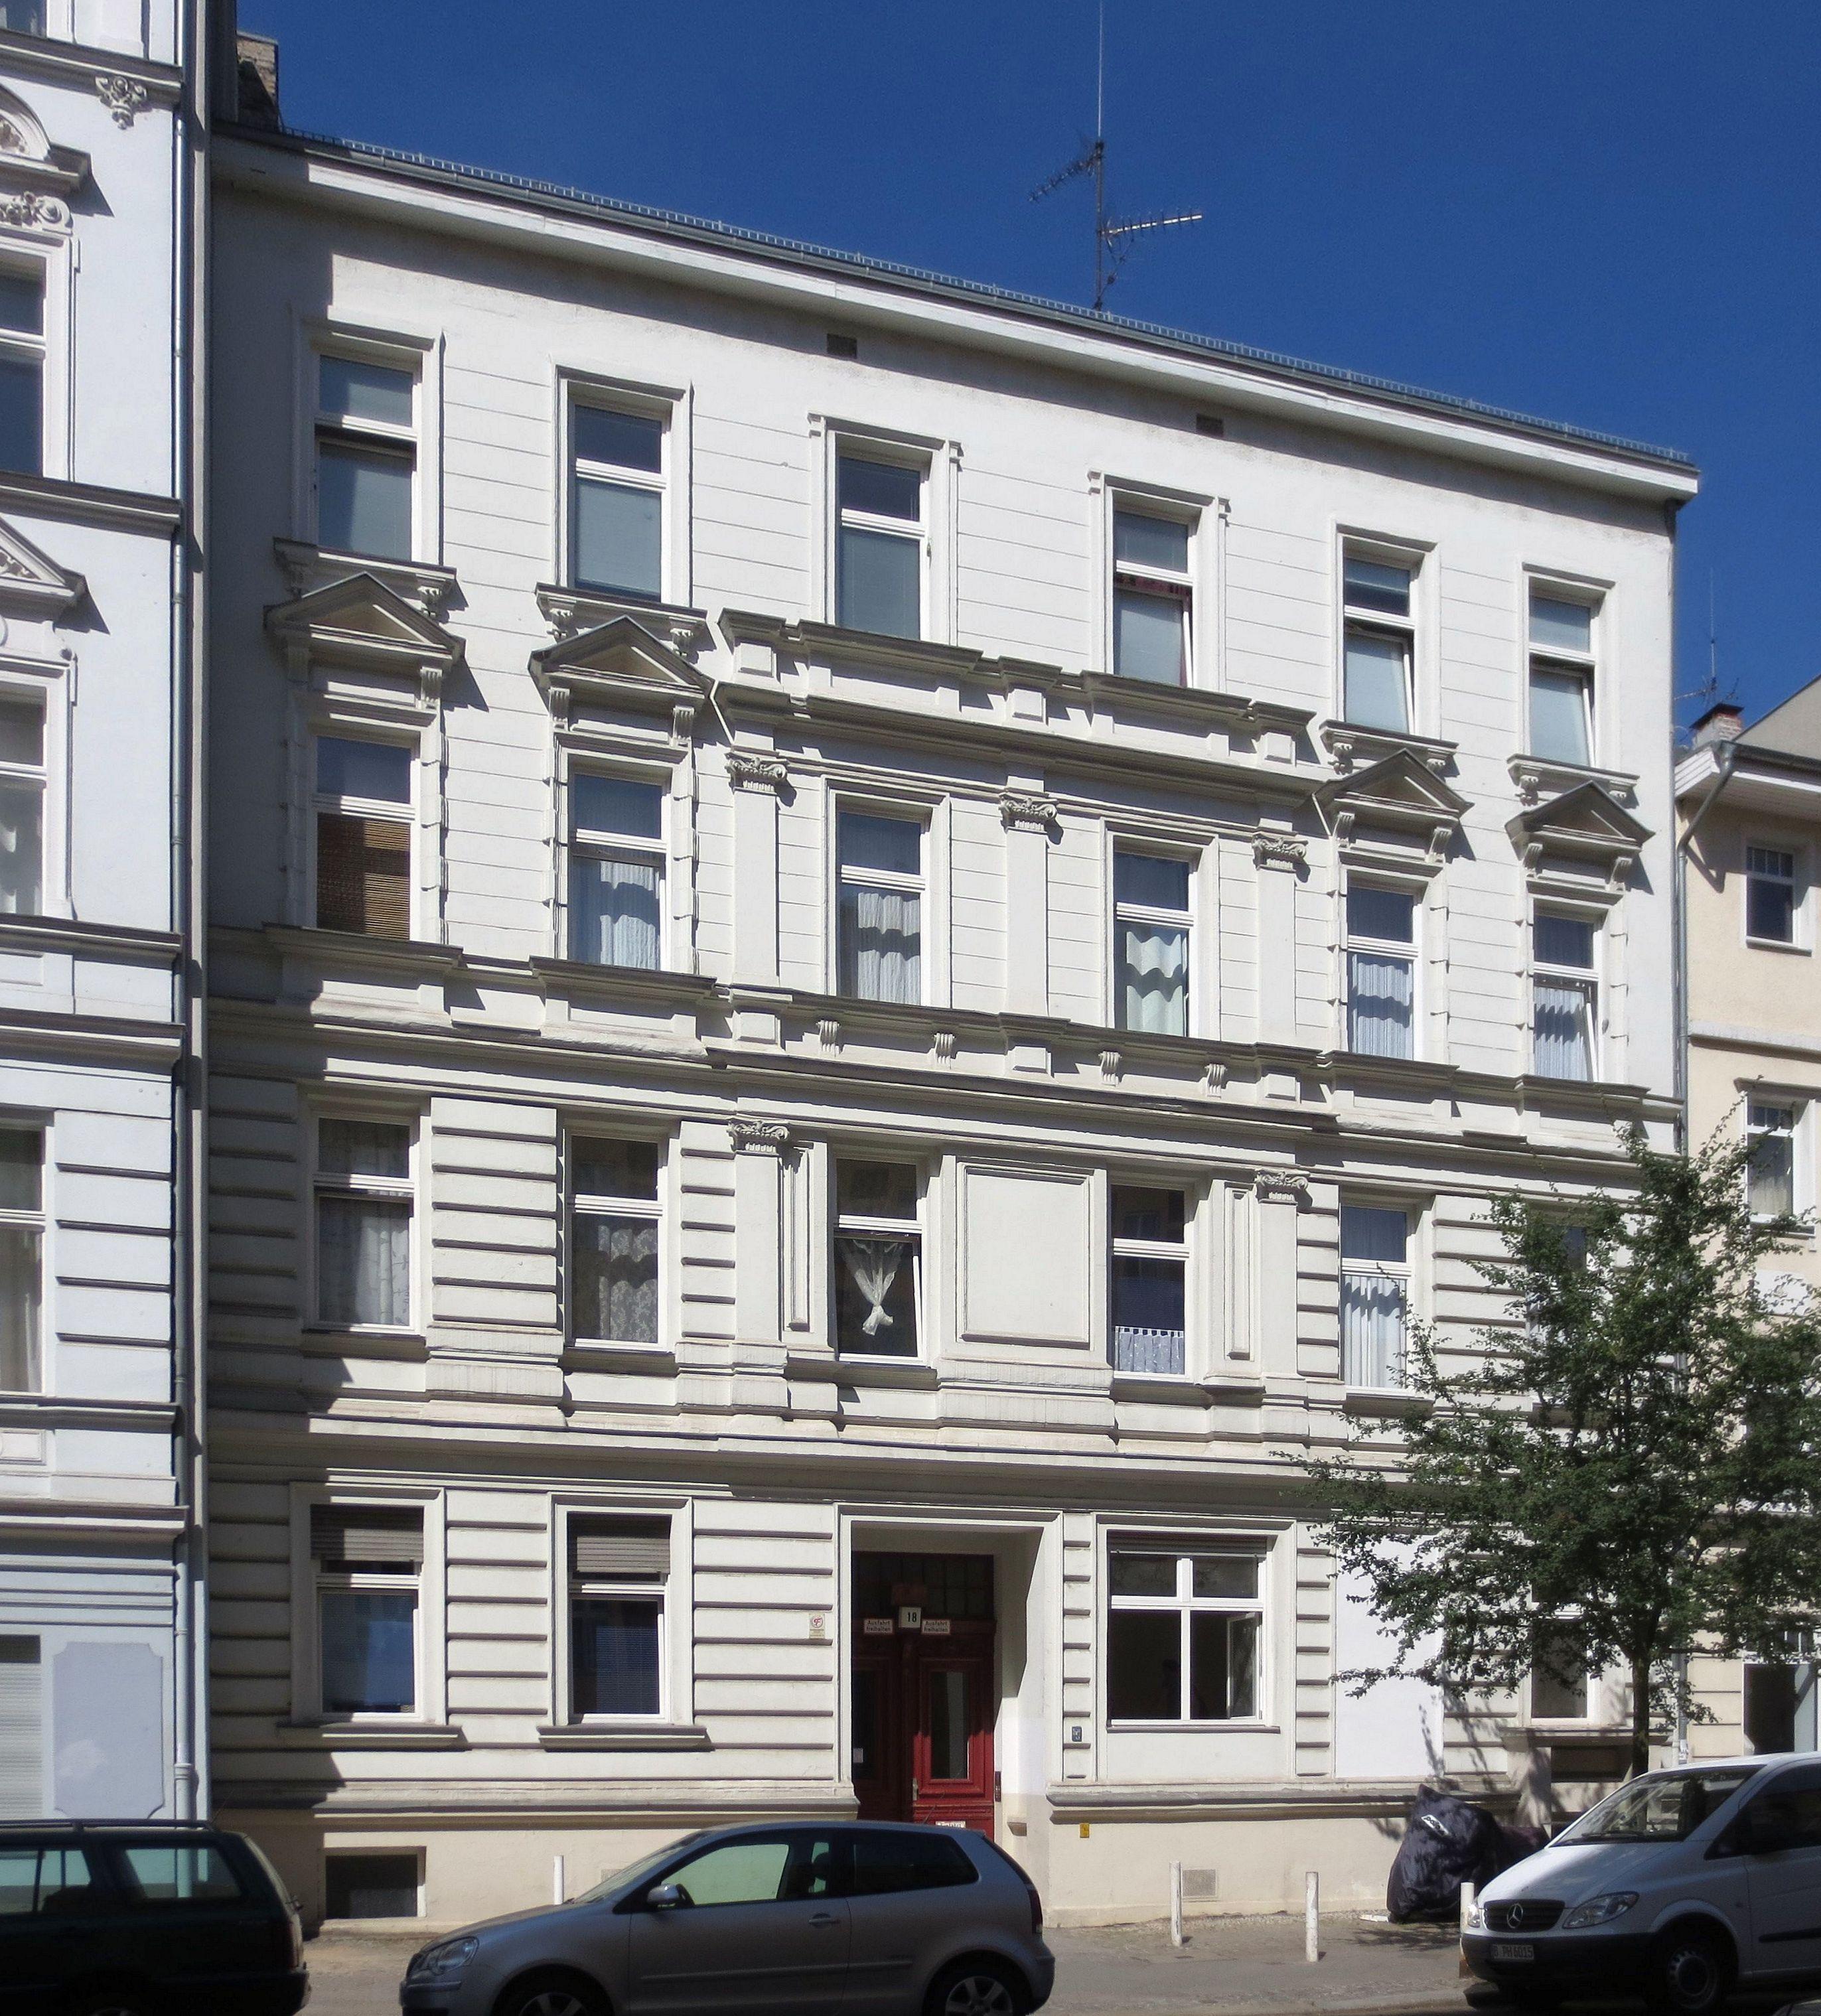 file berlin schoeneberg leberstrasse 18 wikimedia commons. Black Bedroom Furniture Sets. Home Design Ideas